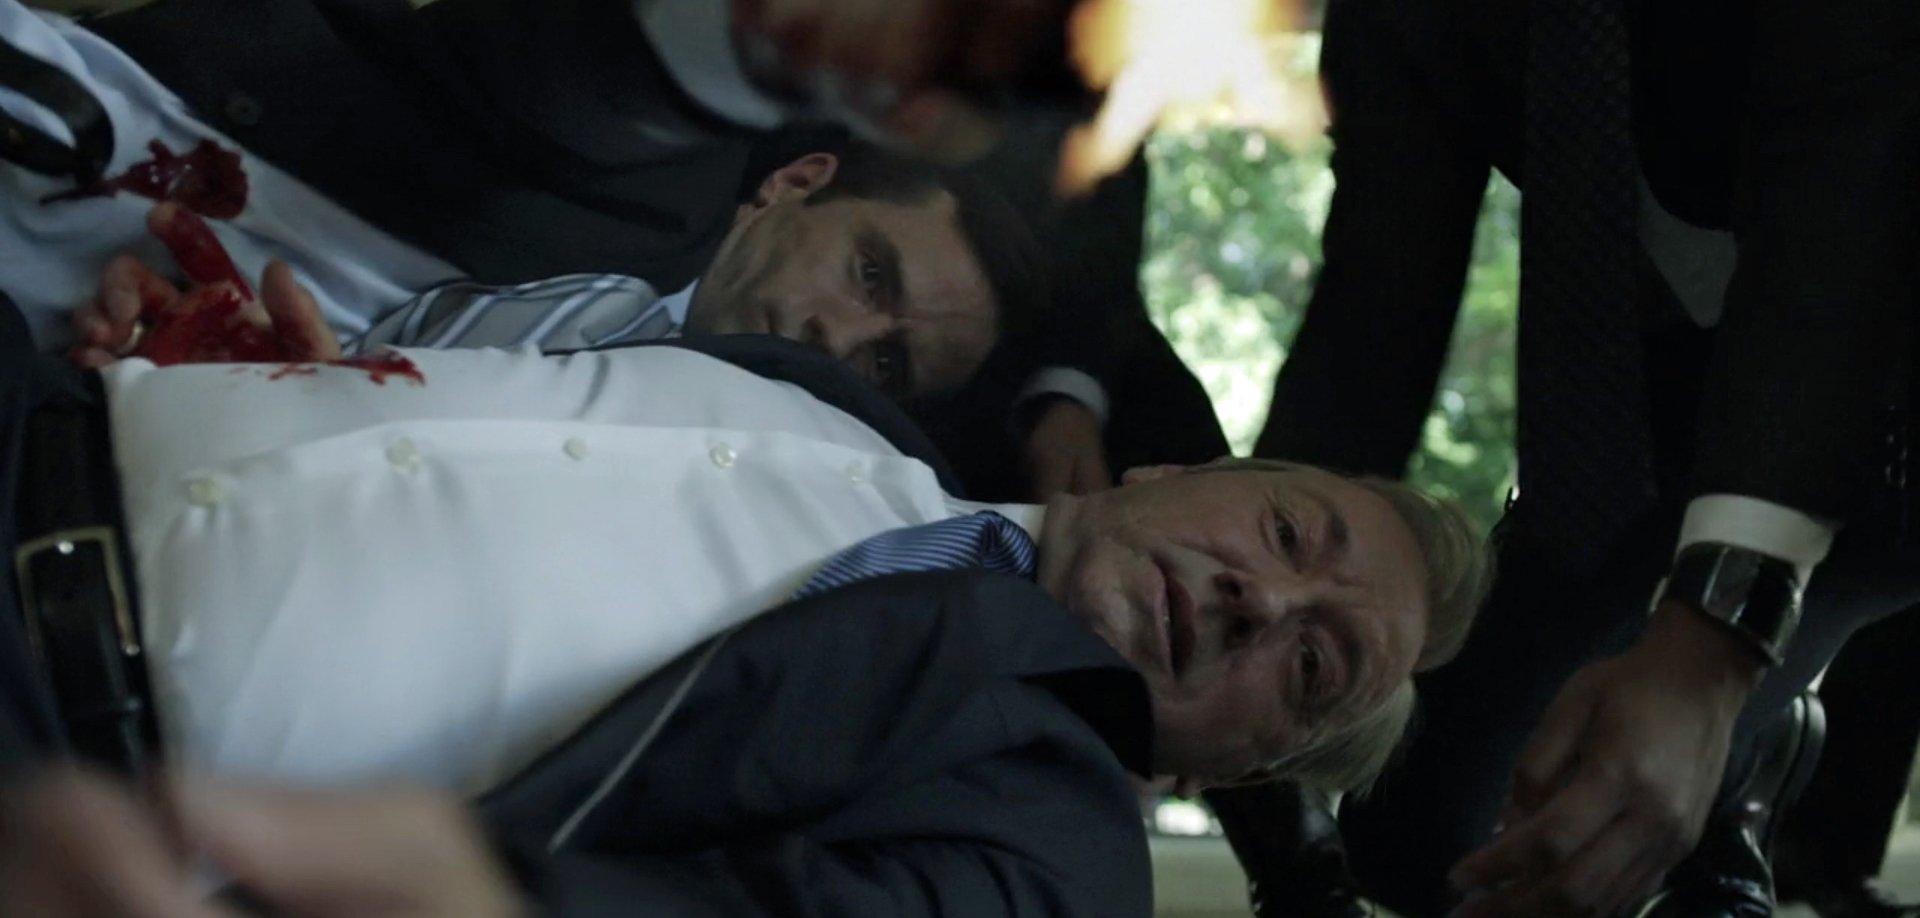 Claire Underwood Style Season 2 Attempted assassinatio...